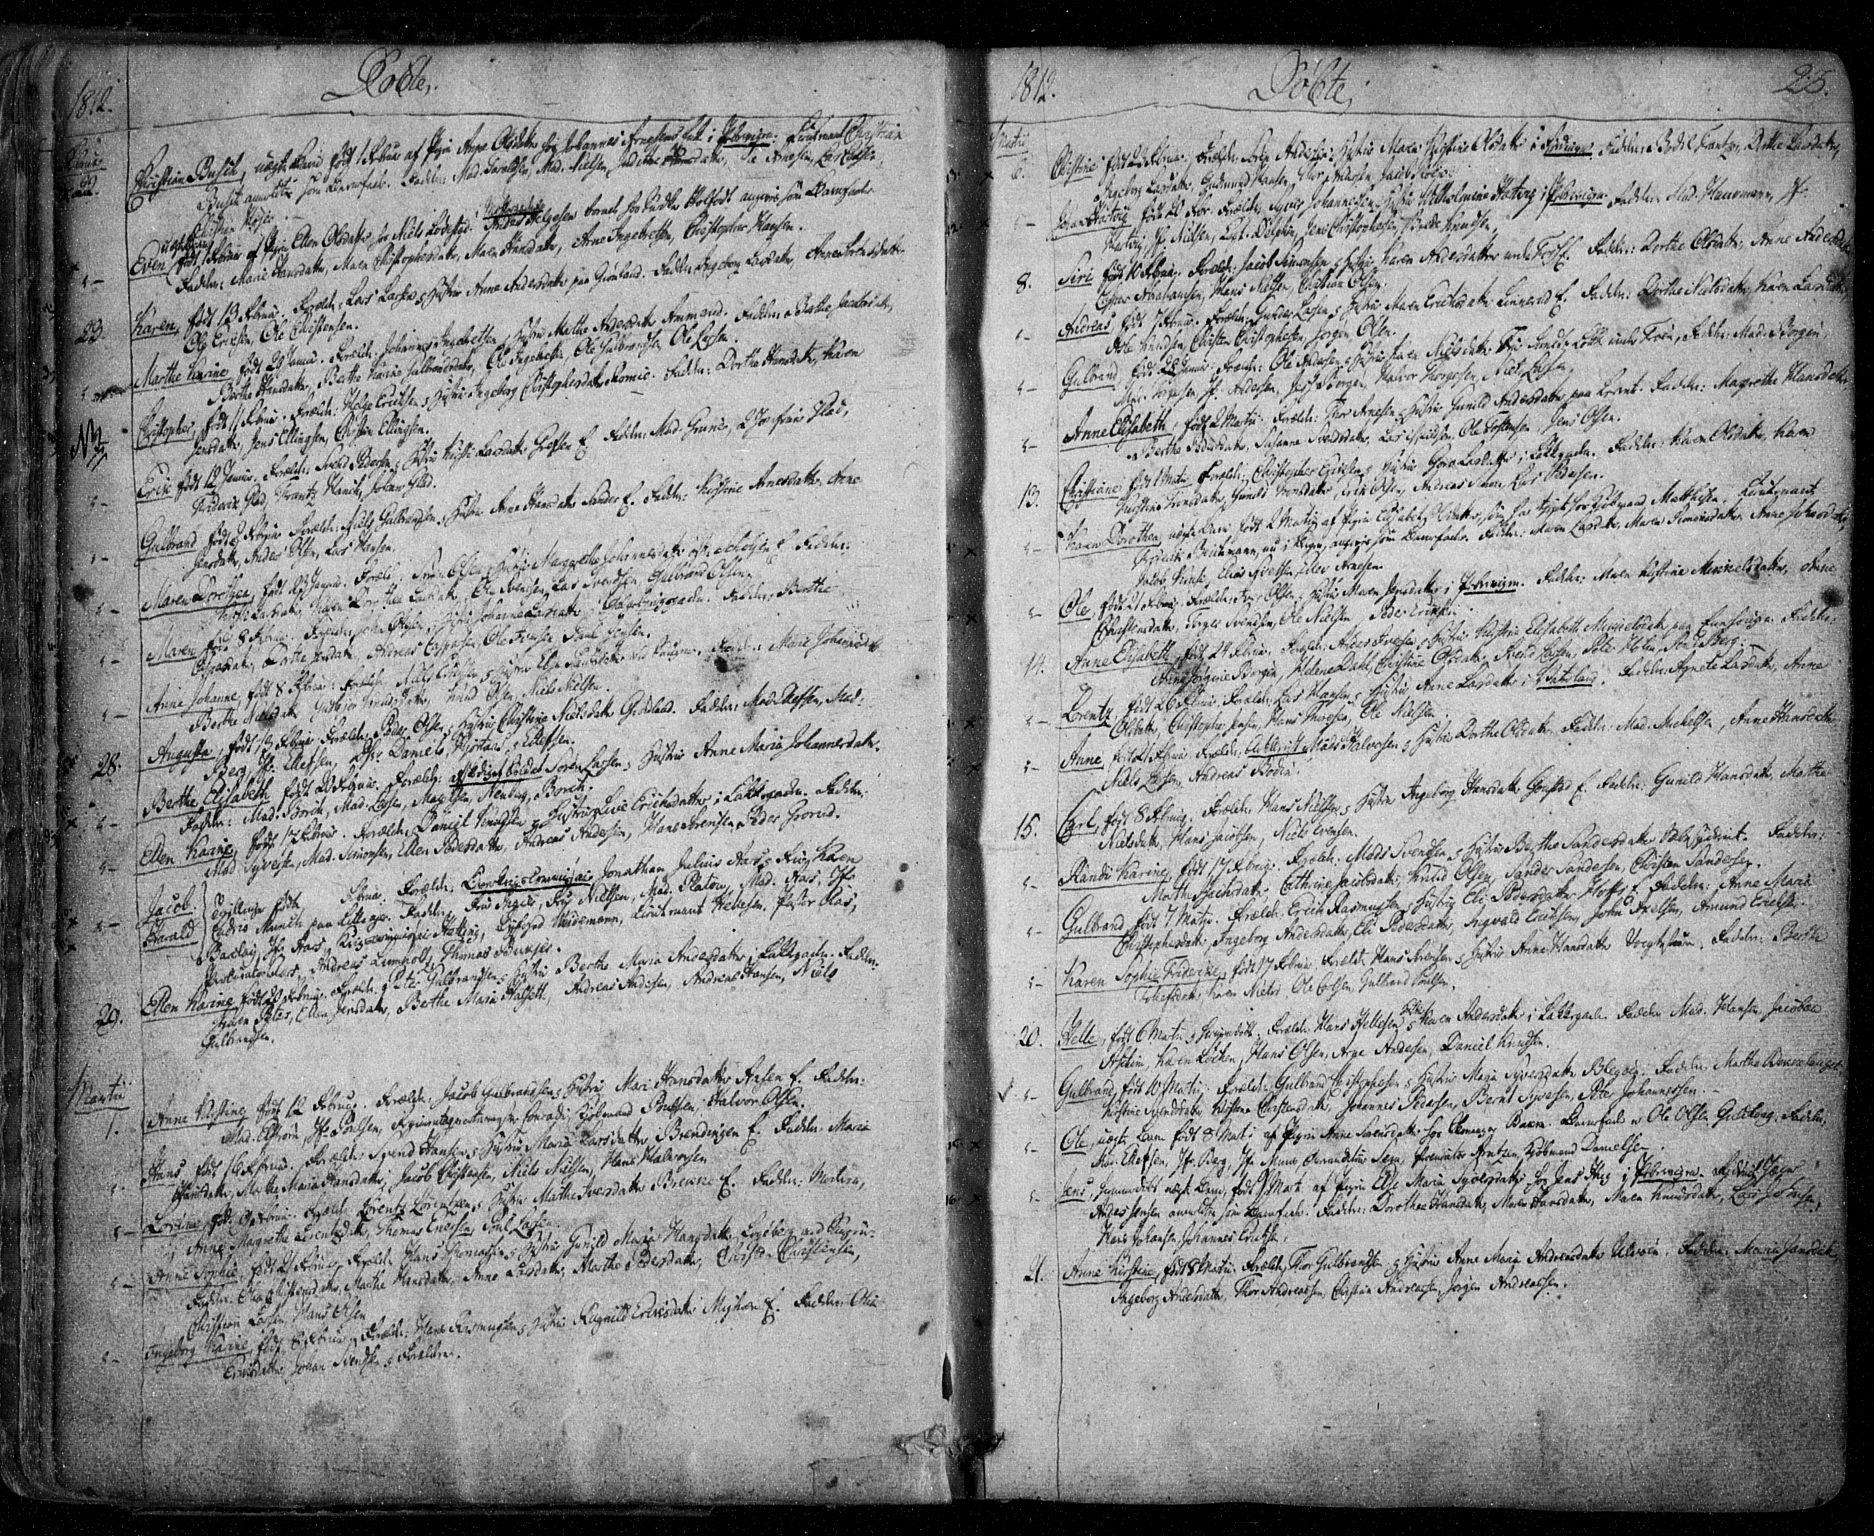 SAO, Aker prestekontor kirkebøker, F/L0011: Parish register (official) no. 11, 1810-1819, p. 23